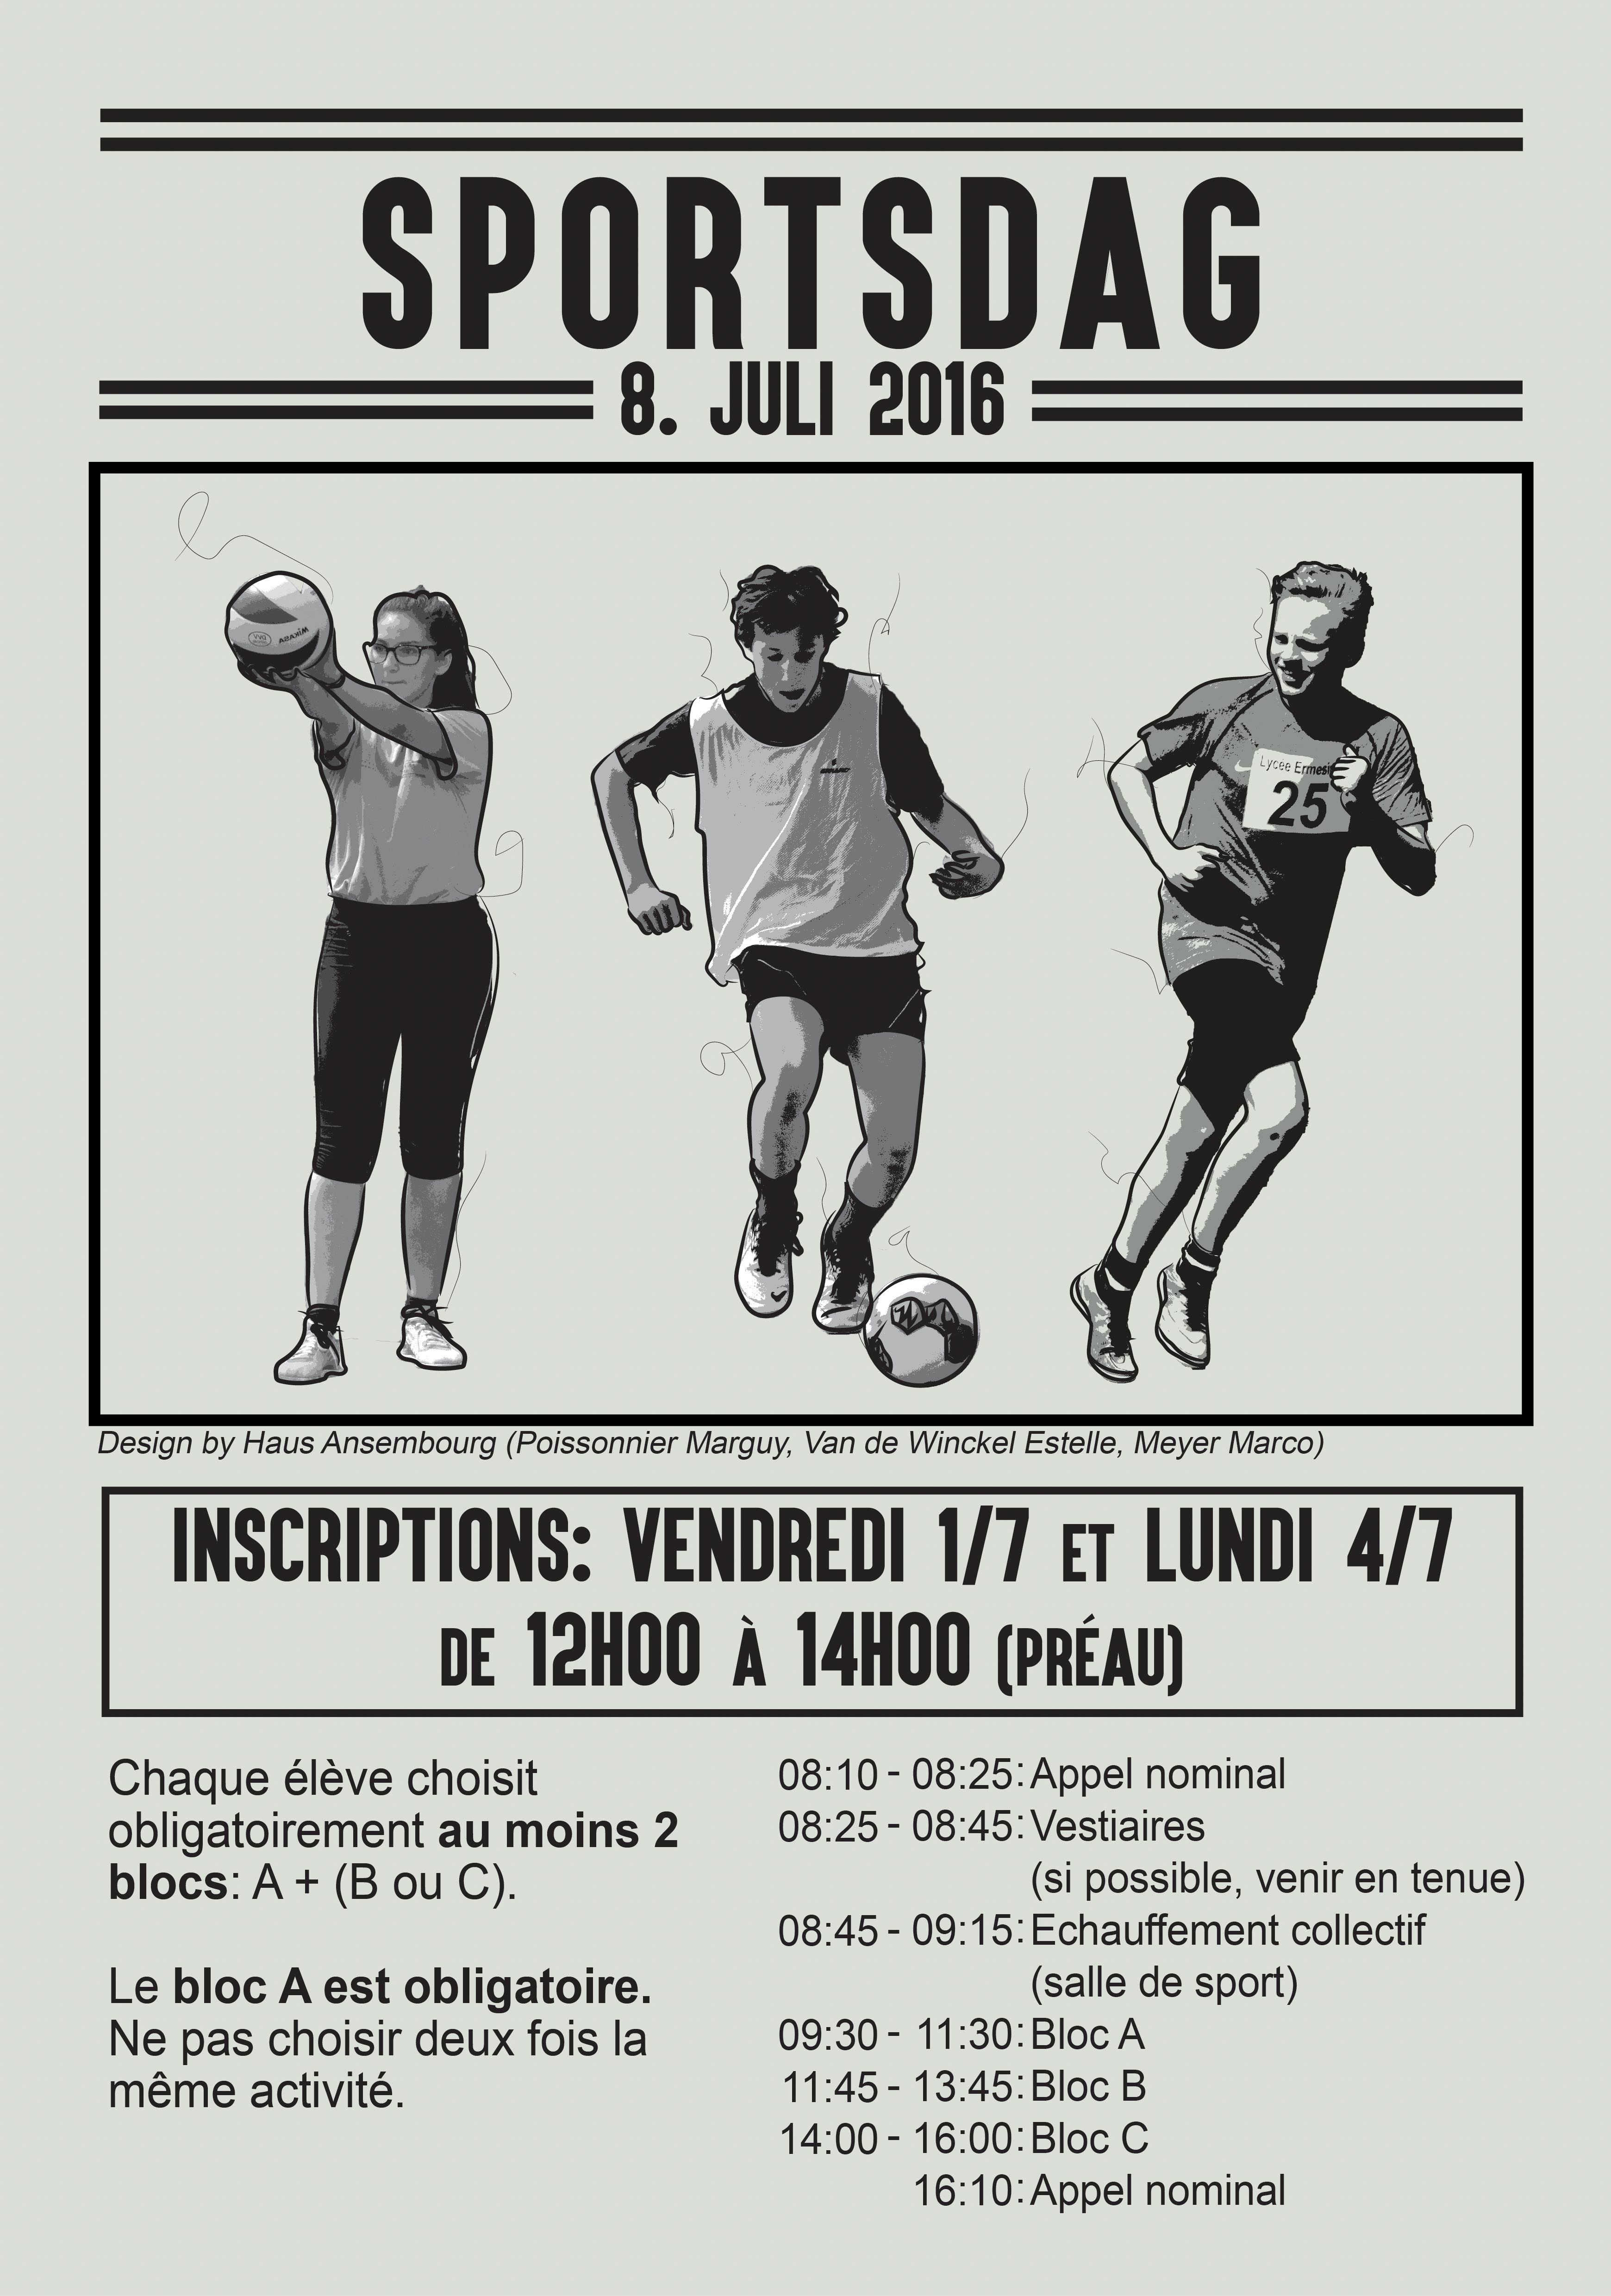 2016 sportsdag